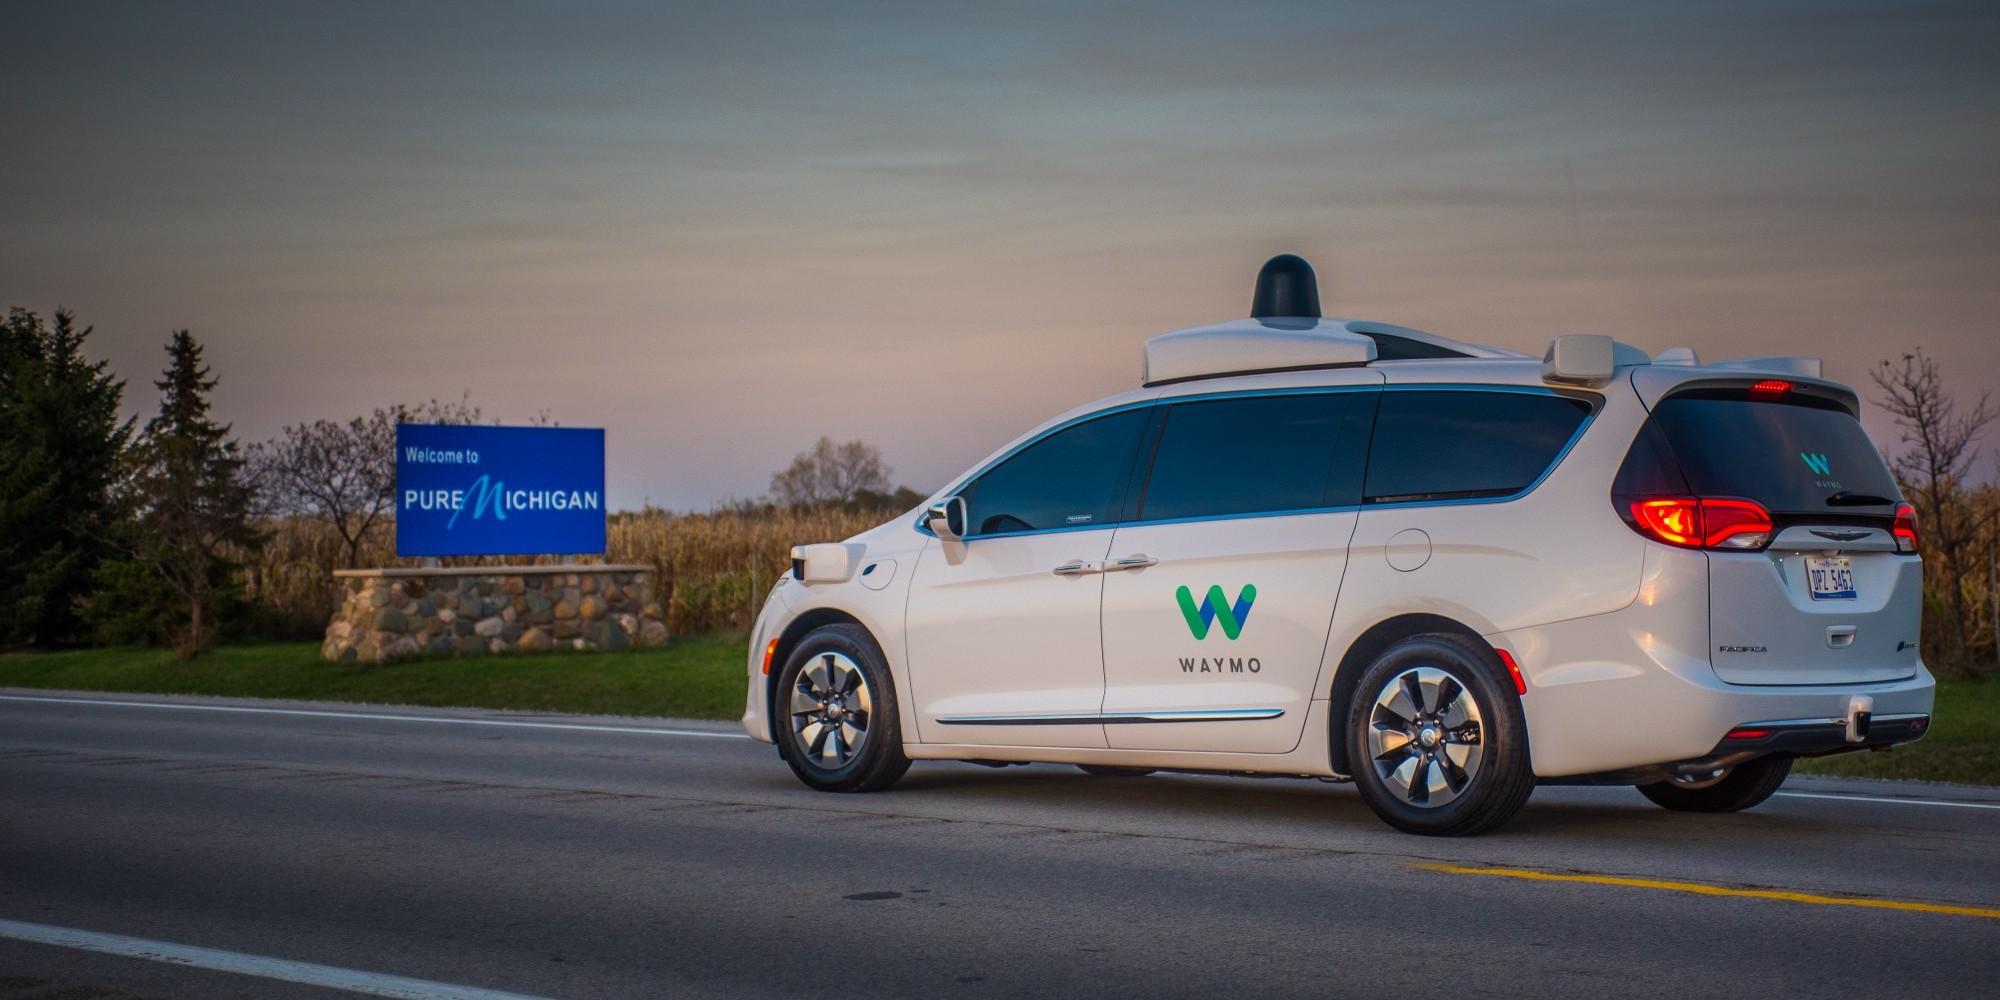 Waymo repurposing Detroit factory to make self-driving cars, opening mid-2019